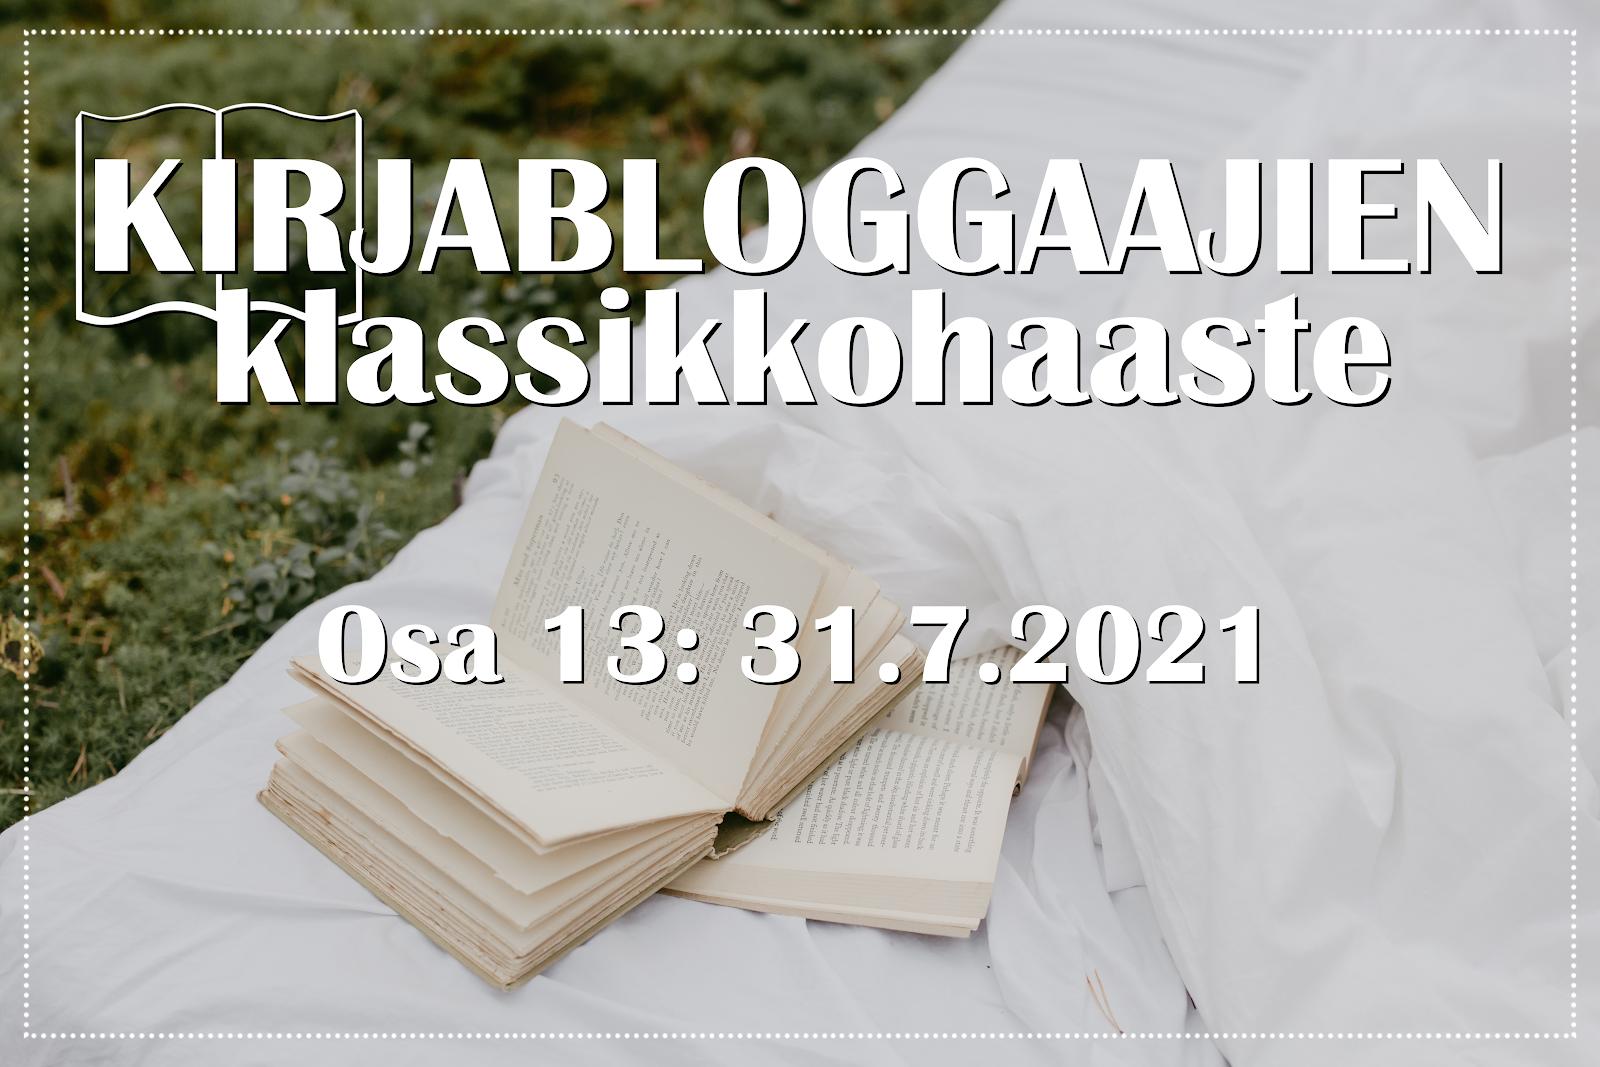 Kirjabloggaajien klassikkohaaste, osa 13